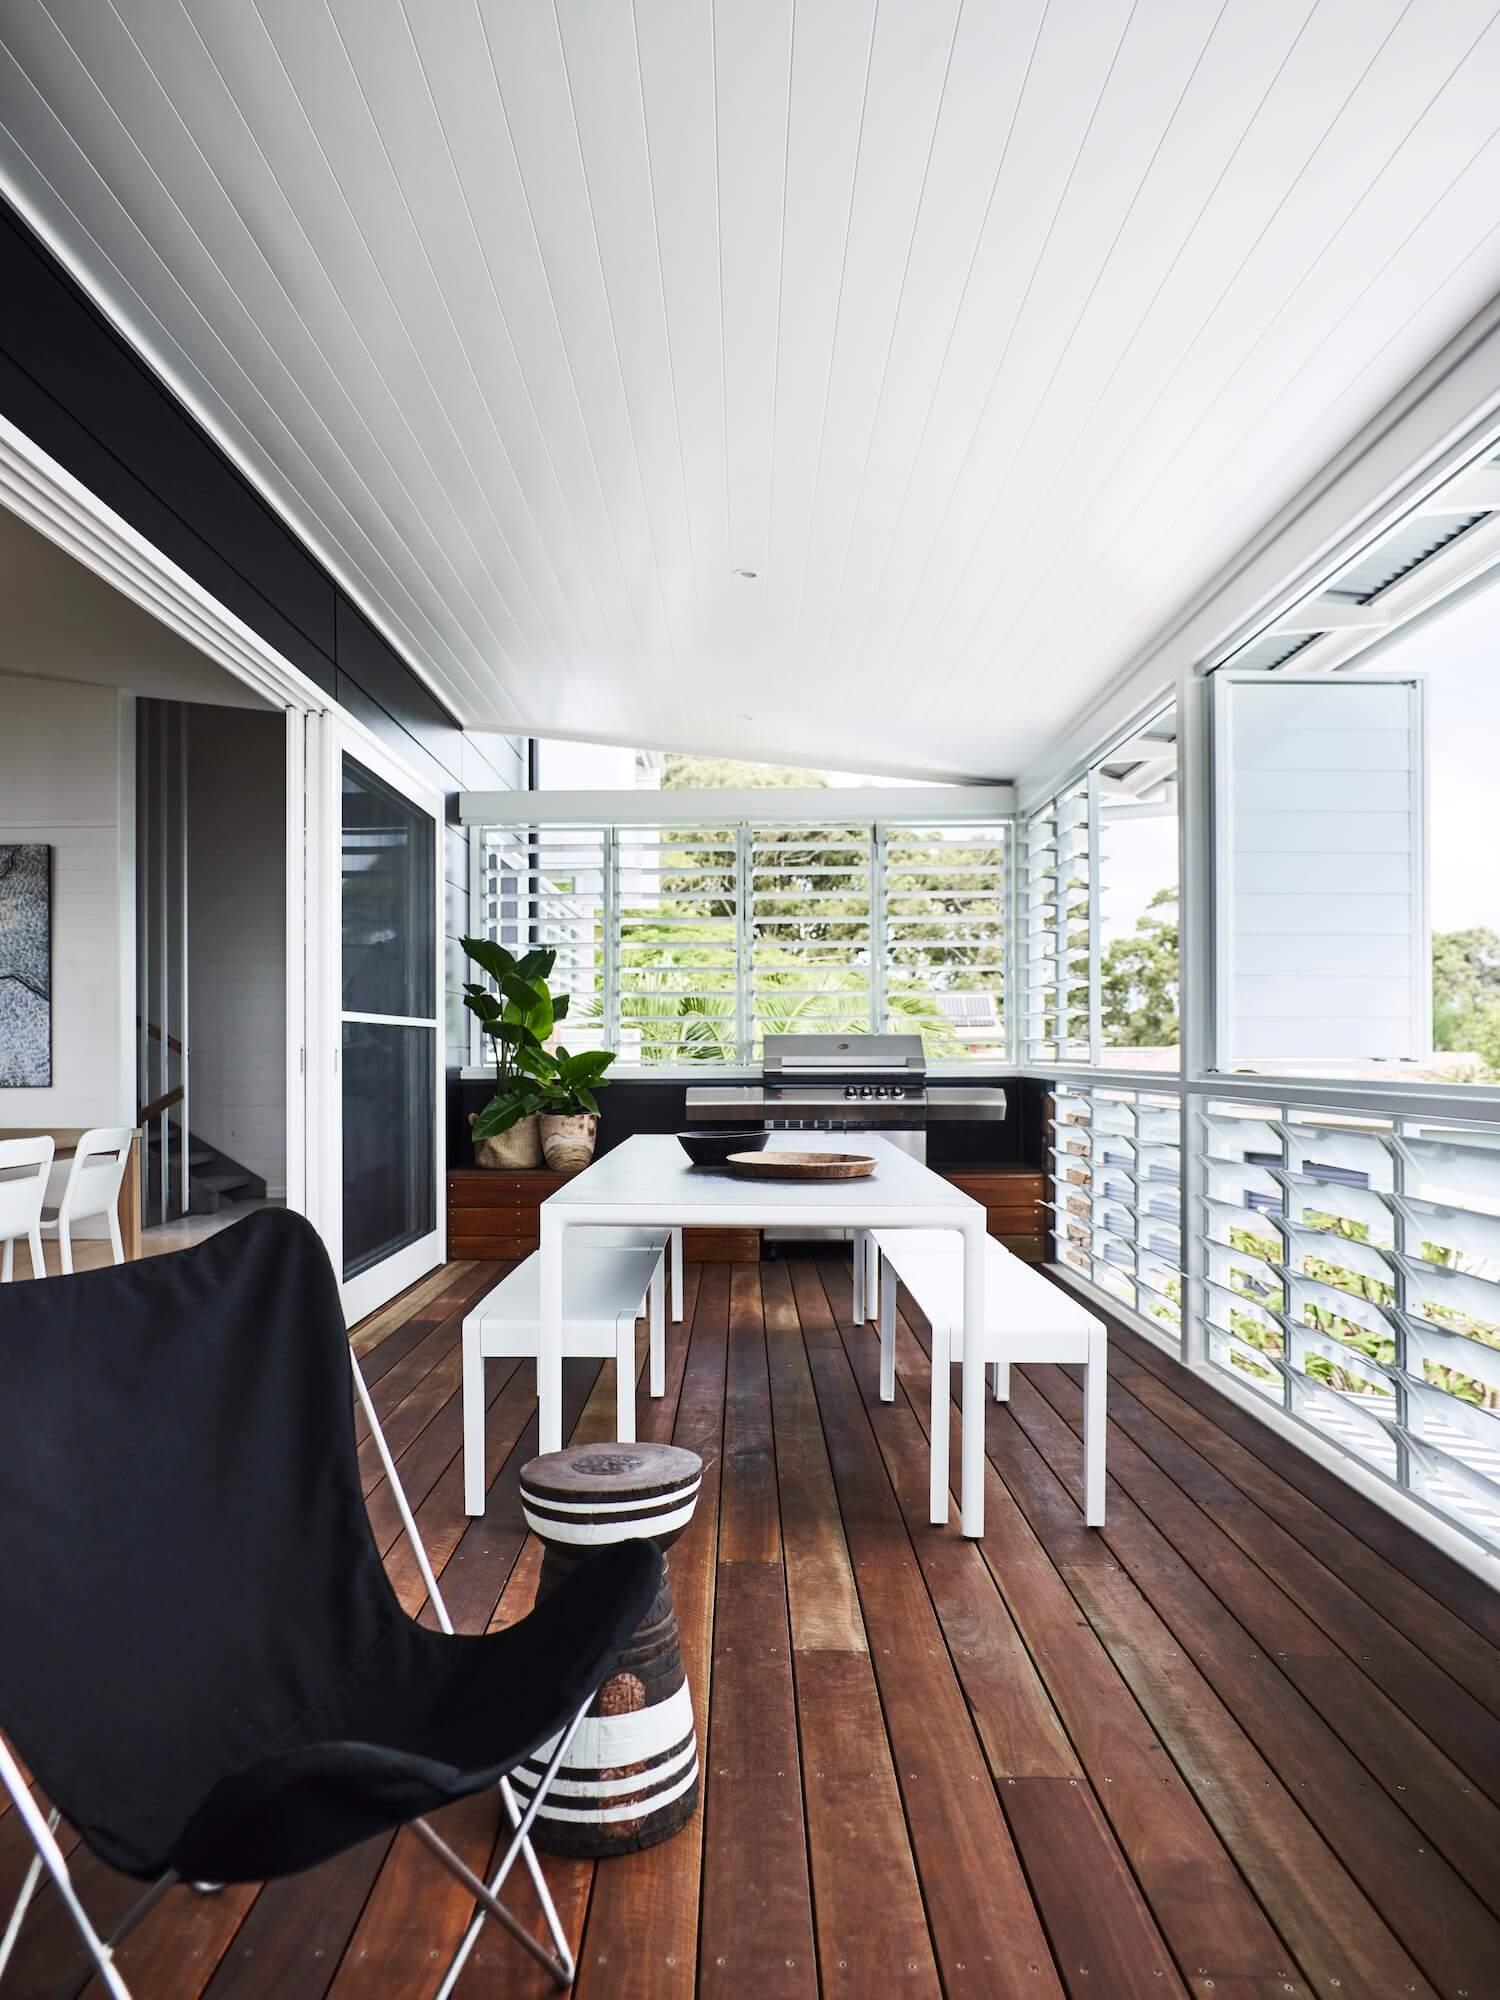 est living interiors ayindi corben architects 12